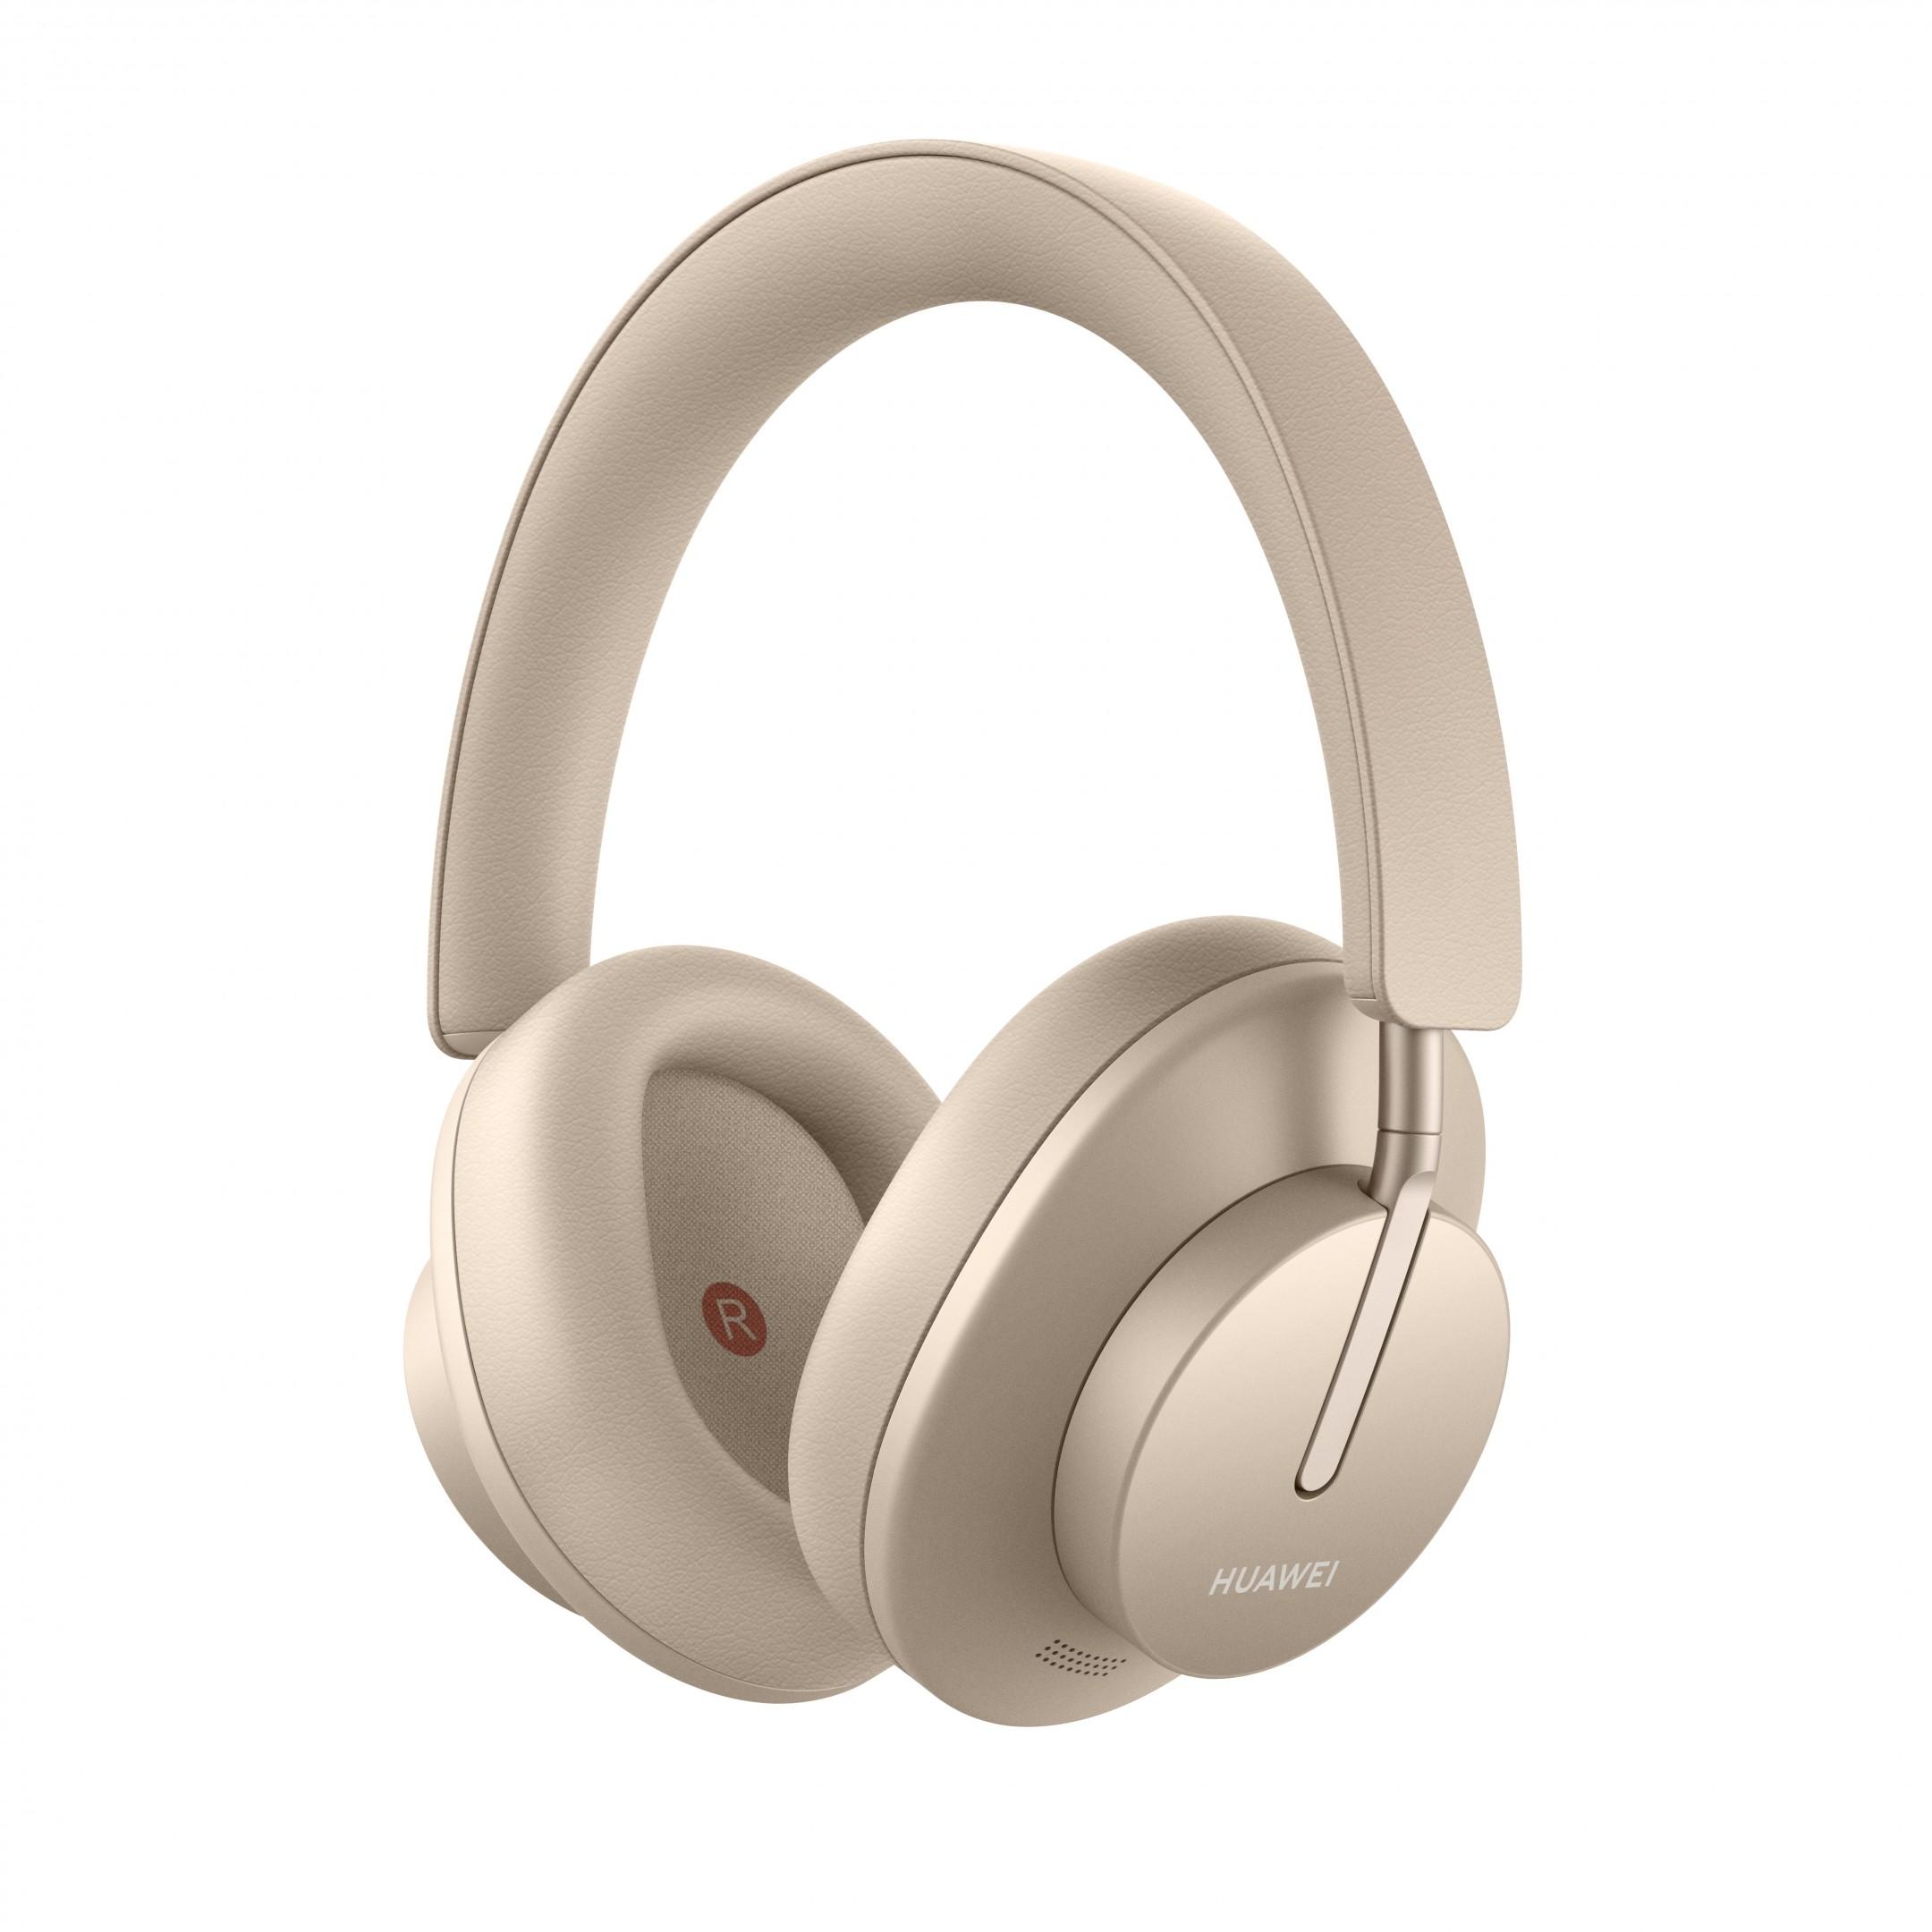 Gürültü Engelleme Sistemli Kulaklık: HUAWEI FreeBuds Studio